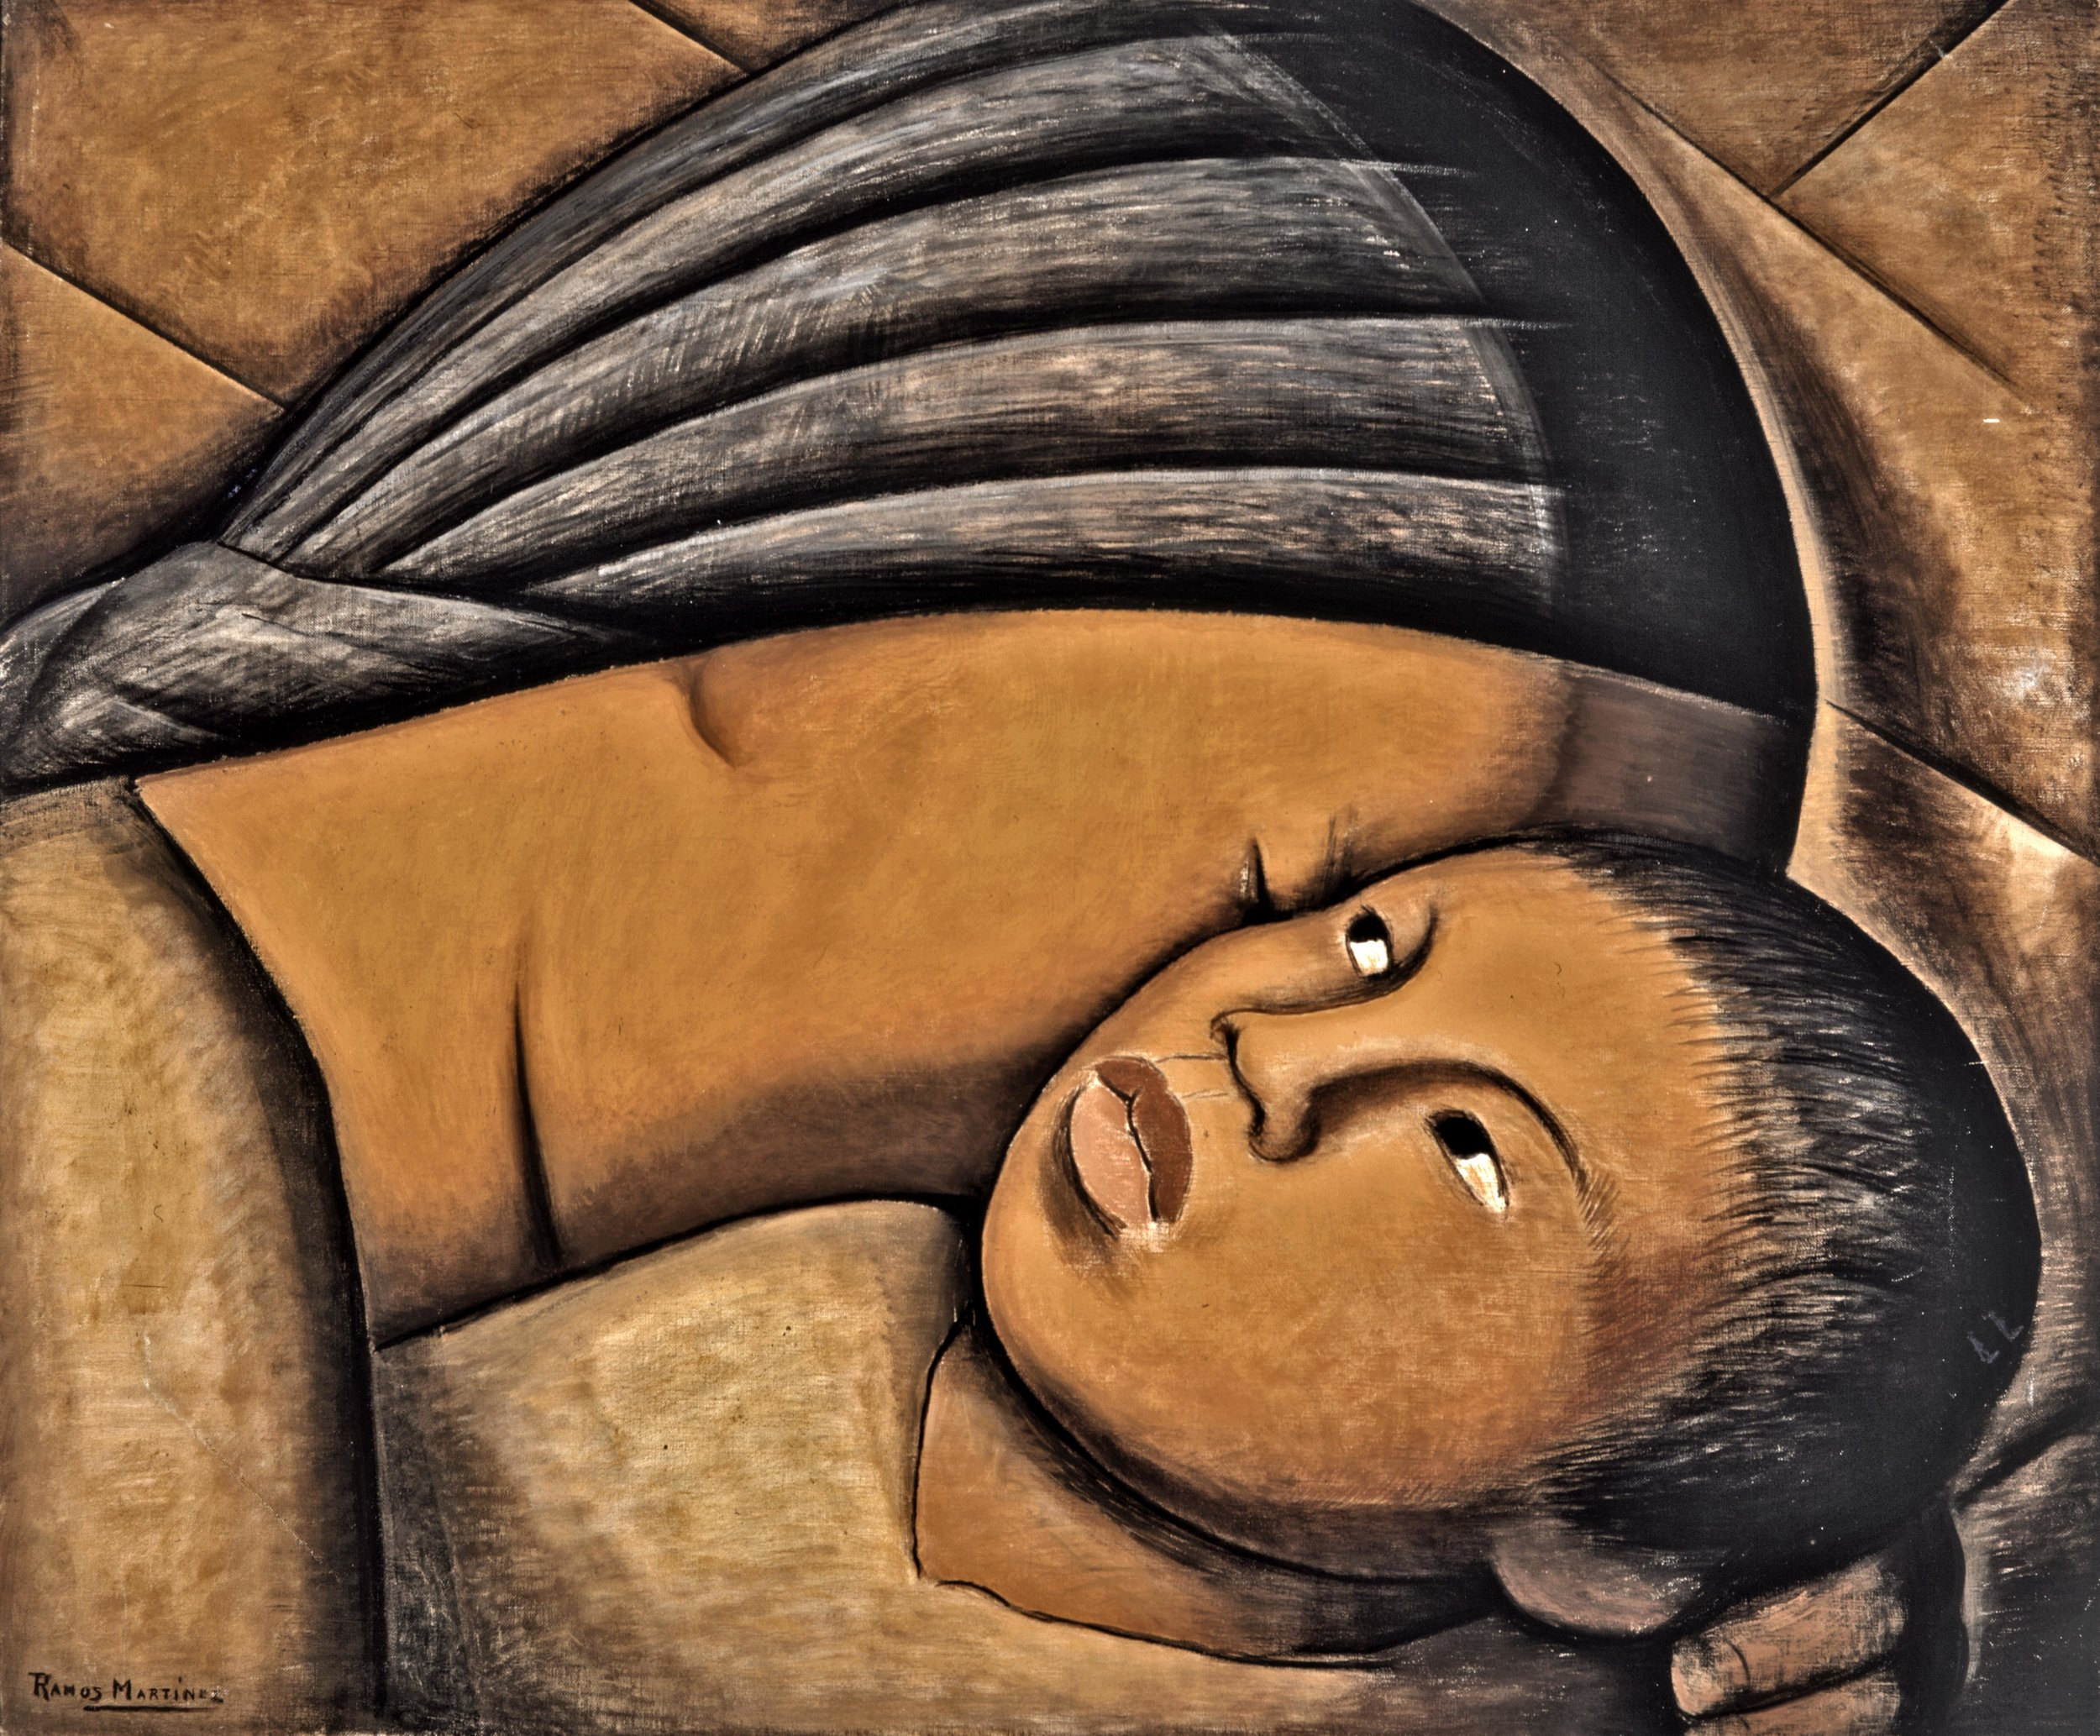 Madre / Mother  ca. 1930  oil on canvas / óleo sobre tela 38 x 46 inches; 96.5 x 116.5 centímetros Private collection